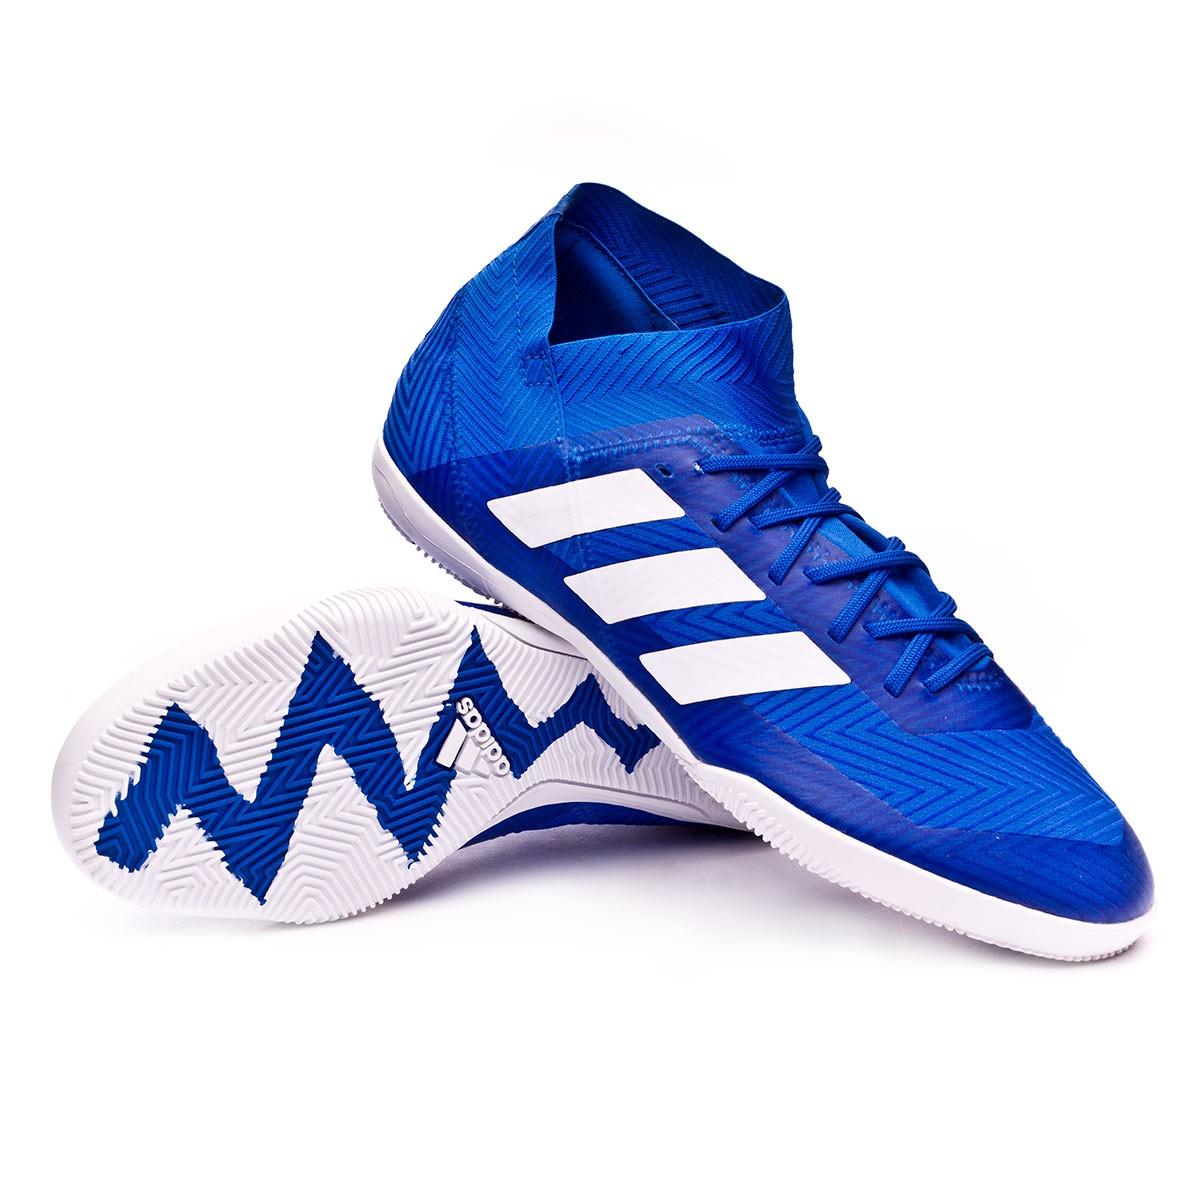 origen metodología Soplar  Futsal Boot adidas Nemeziz Tango 18.3 IN Football blue-White-Football blue  - Football store Fútbol Emotion